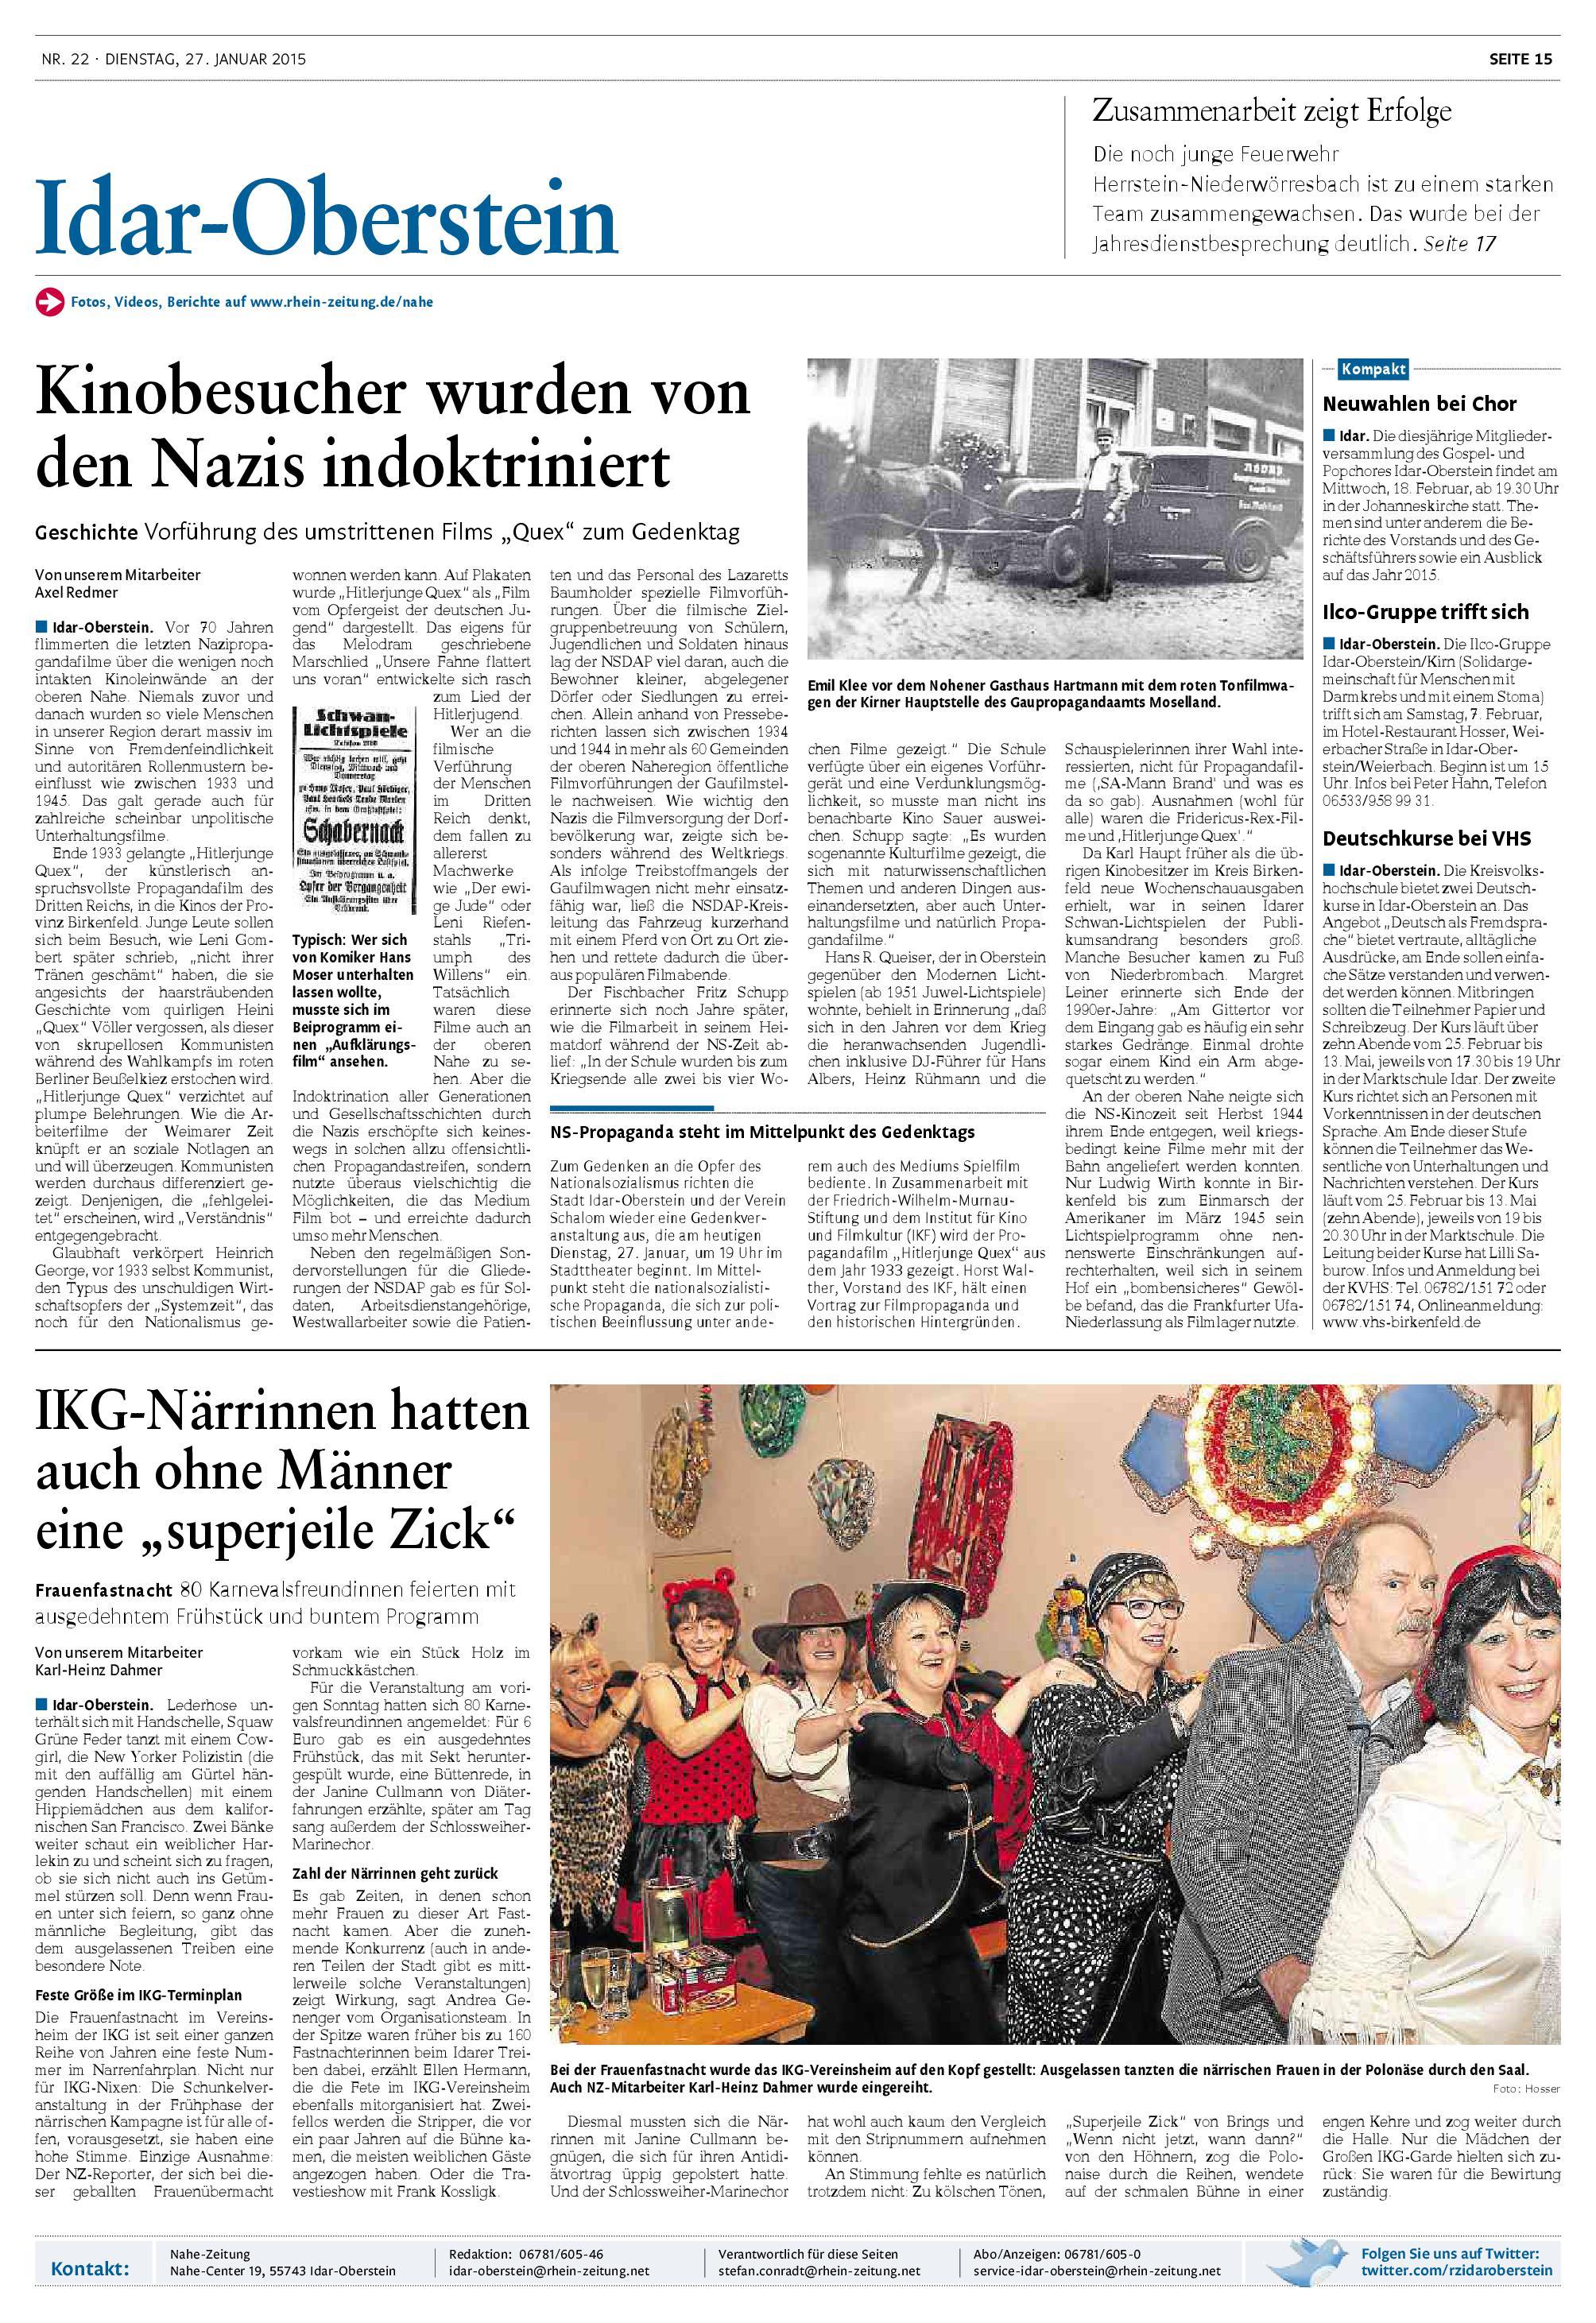 27.01.2015-IKG-Frauenfastnacht-001.jpg